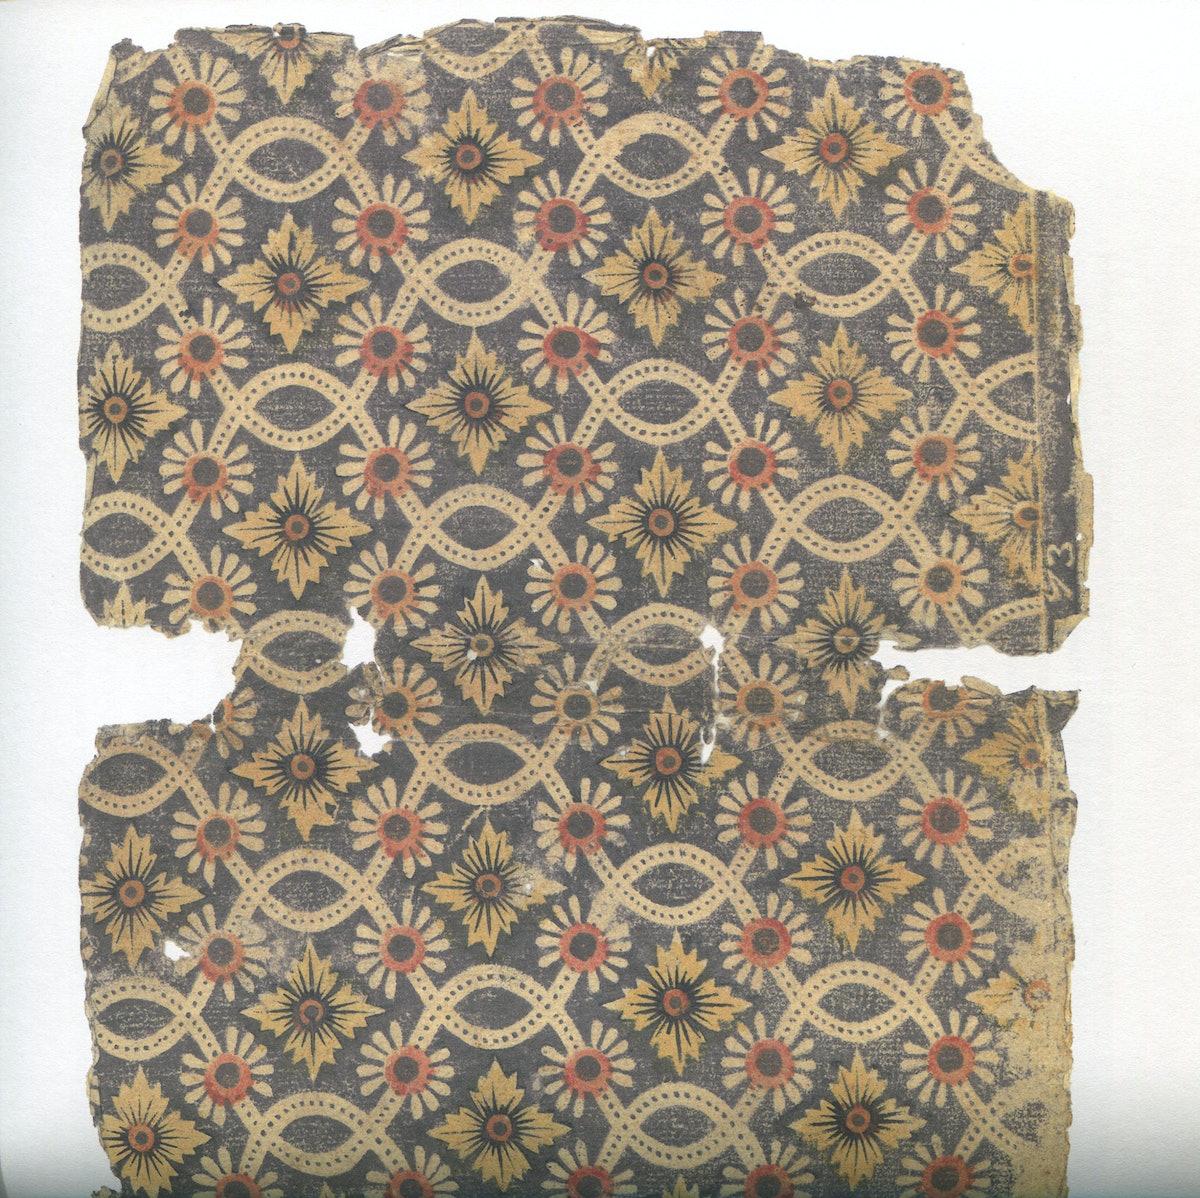 Vintage folk textile